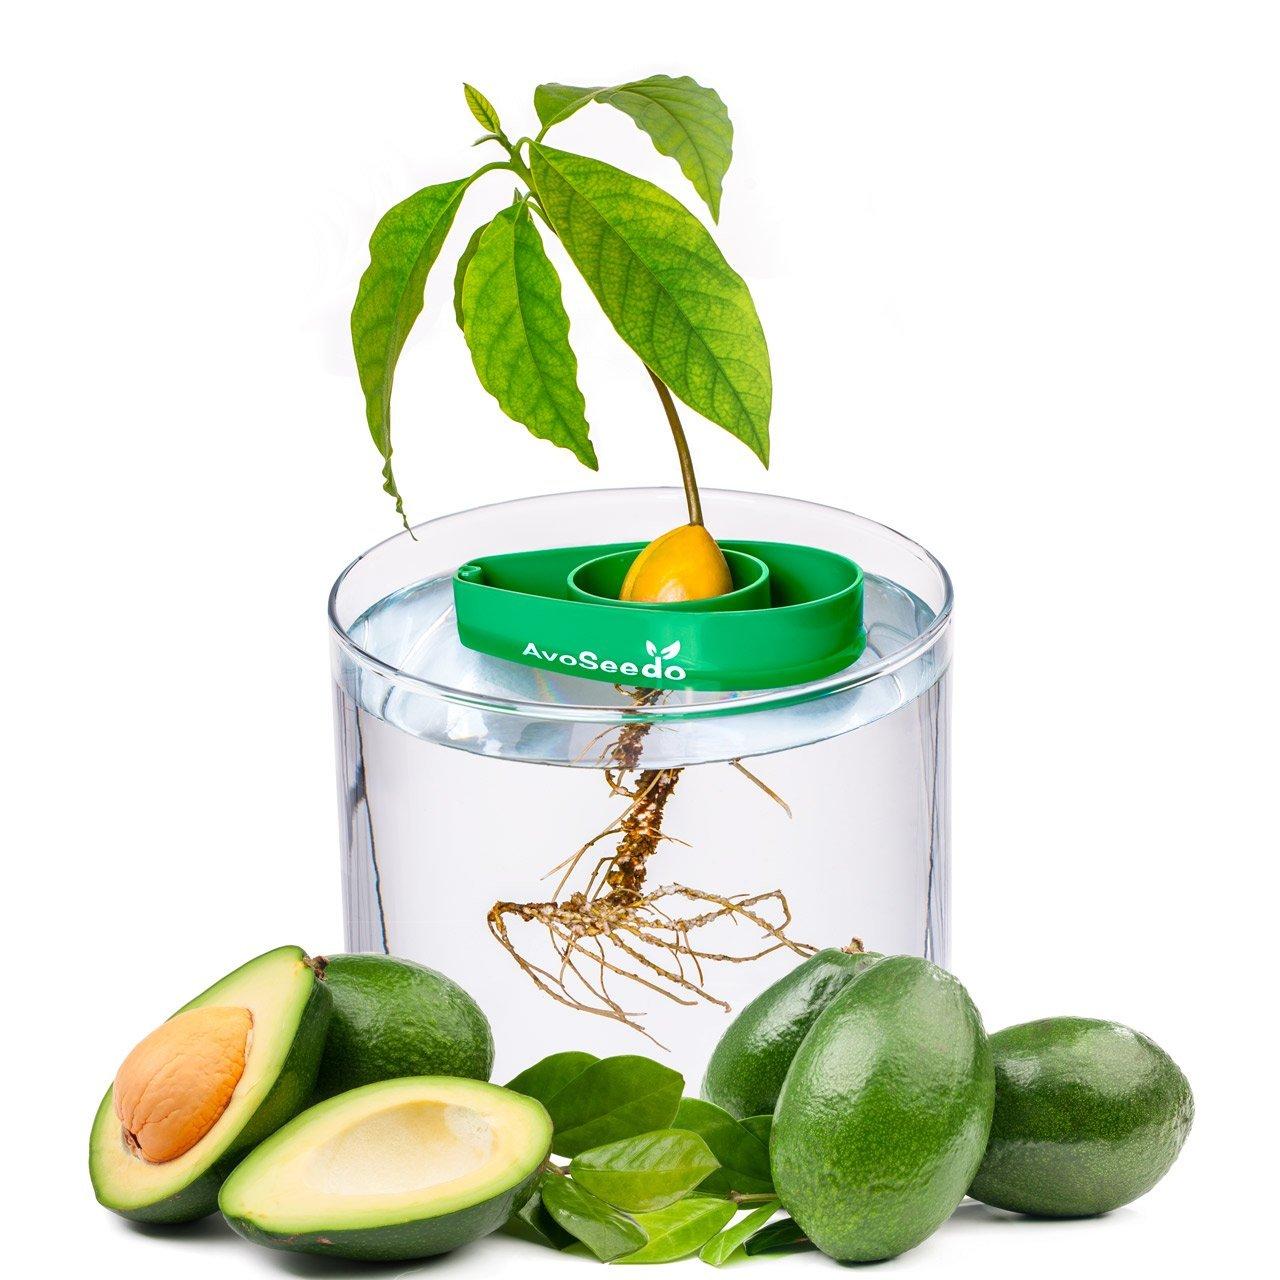 Perfect Avocado Tree Growing Kit for Every Avocado Lover, $10 @amazon.com